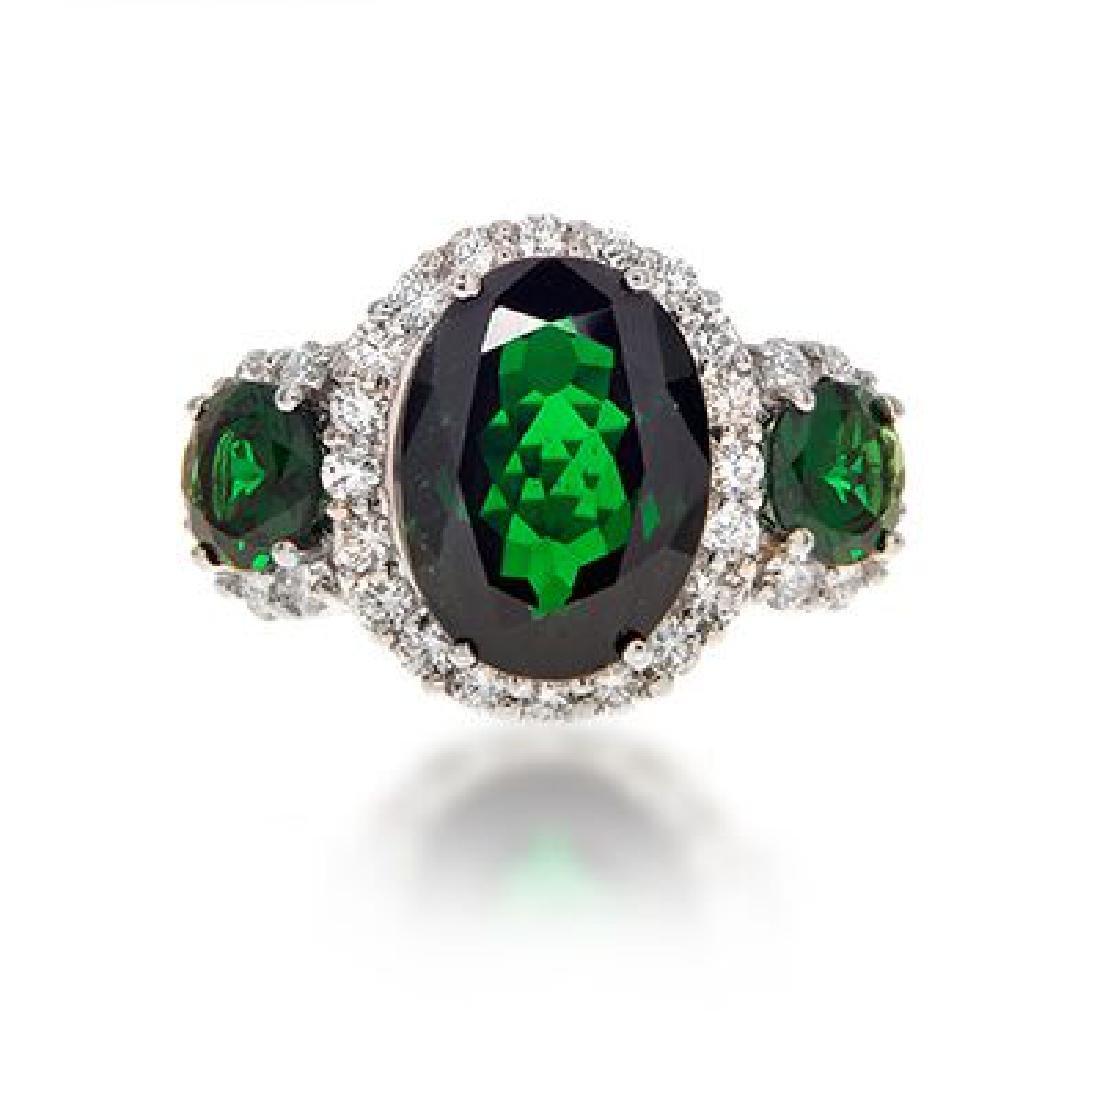 Very Fine 8.05 carat Tsavorite Garnet Ring